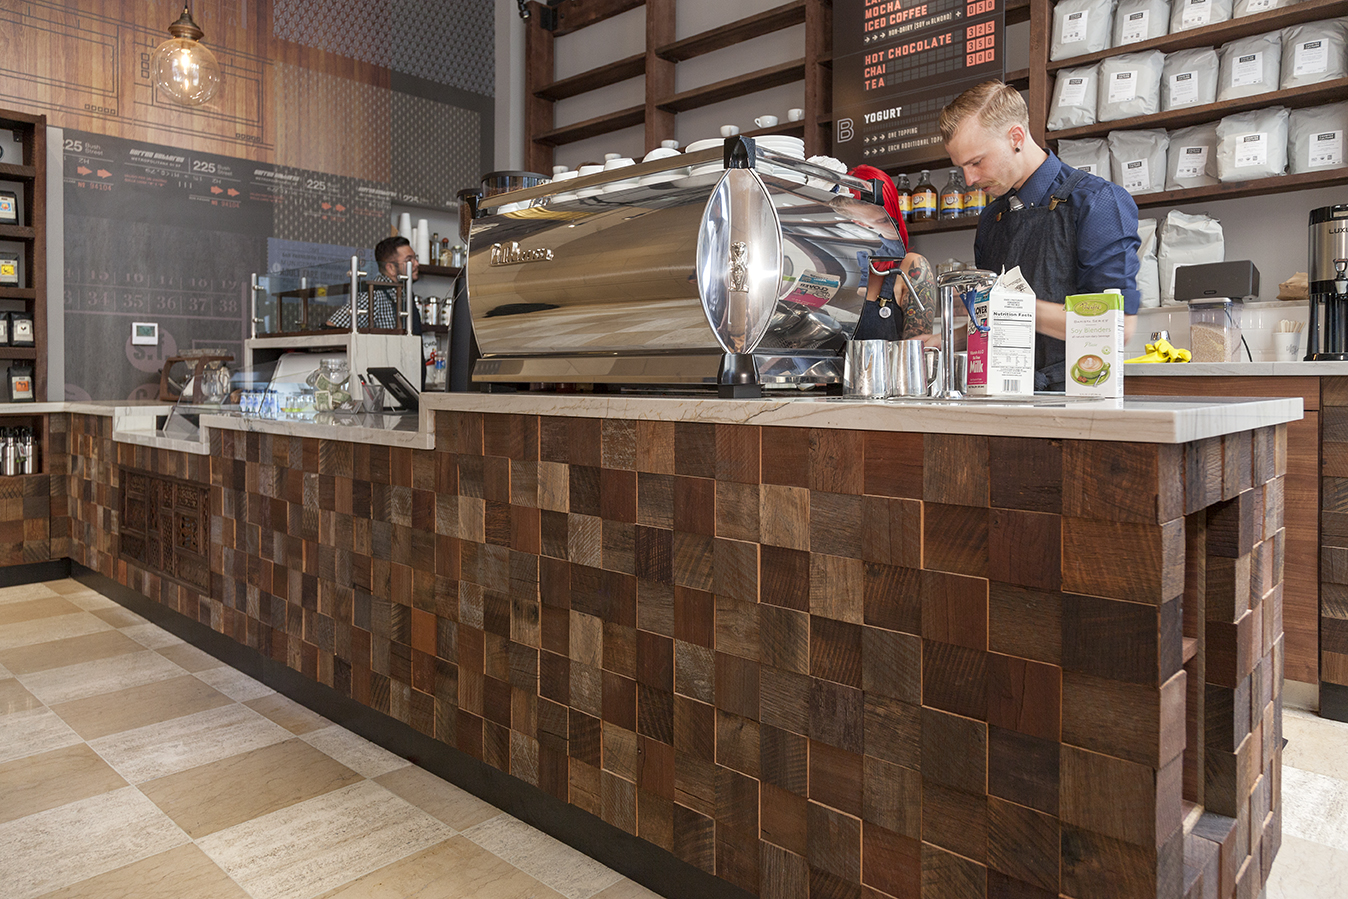 coffeeculture_3399_LR.jpg